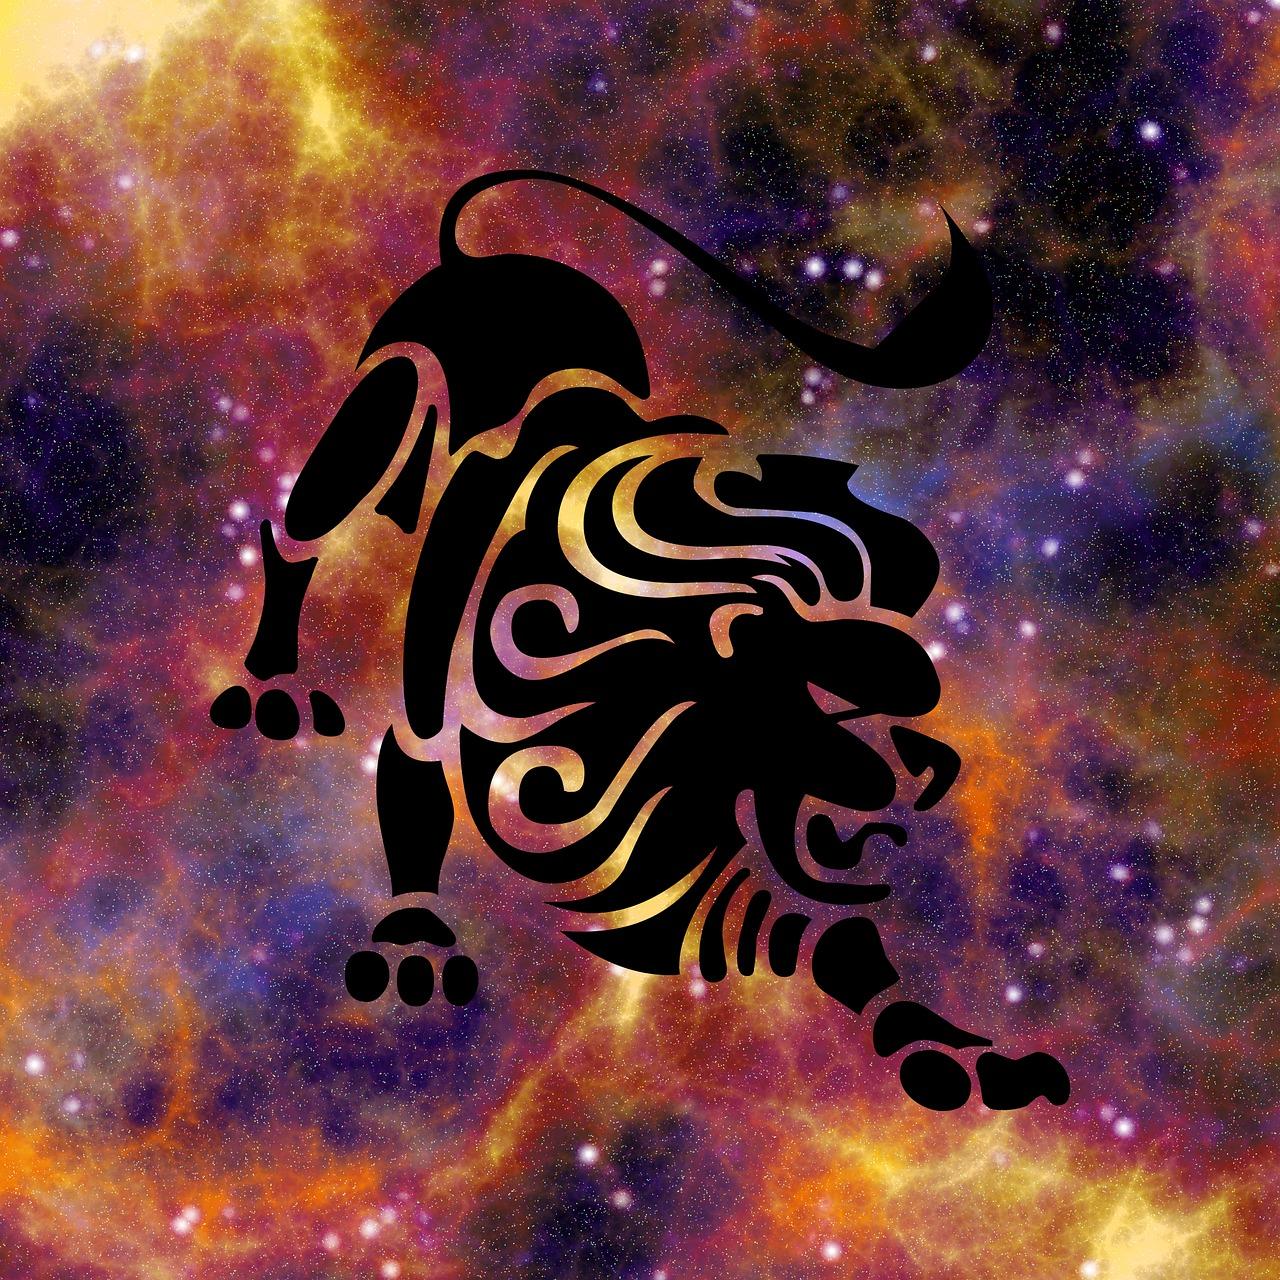 horoskop keuangan leo maret 2021